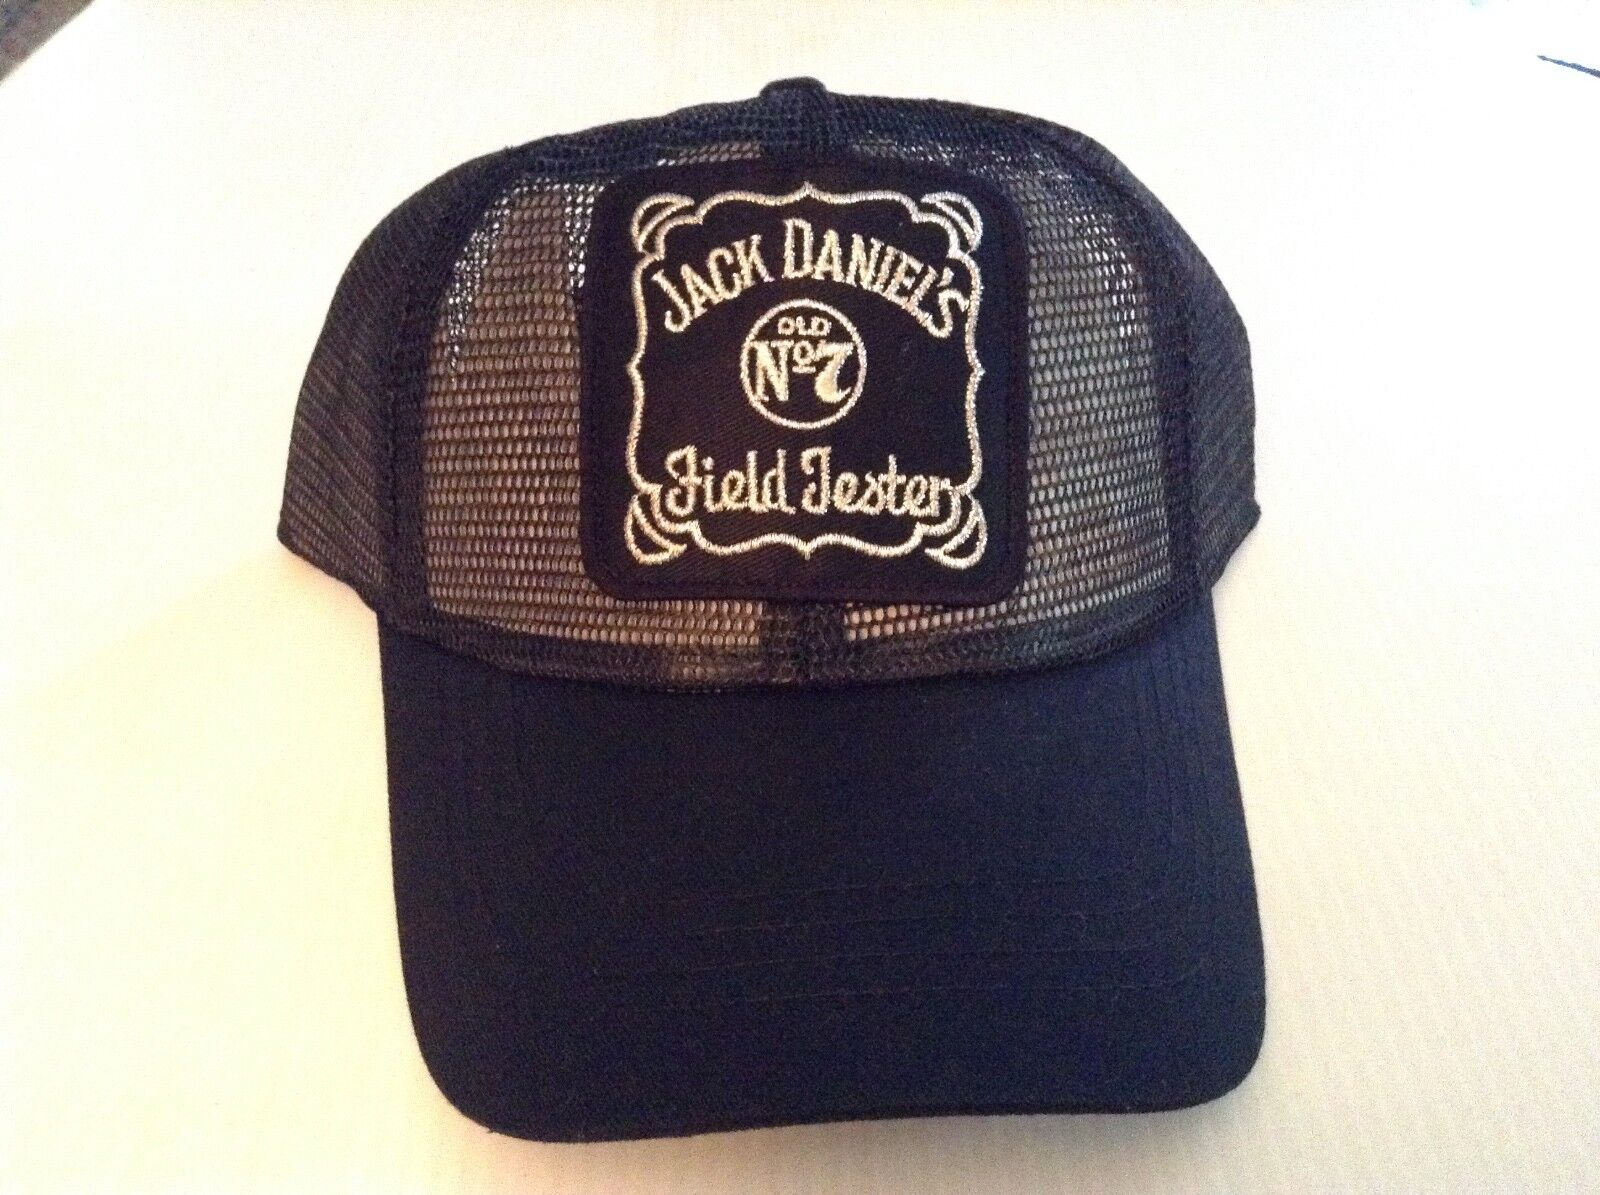 VTG New Jack Jack Jack Daniels Field Tester Patch Mesh Snapback Trucker Hat - Cool e59a04